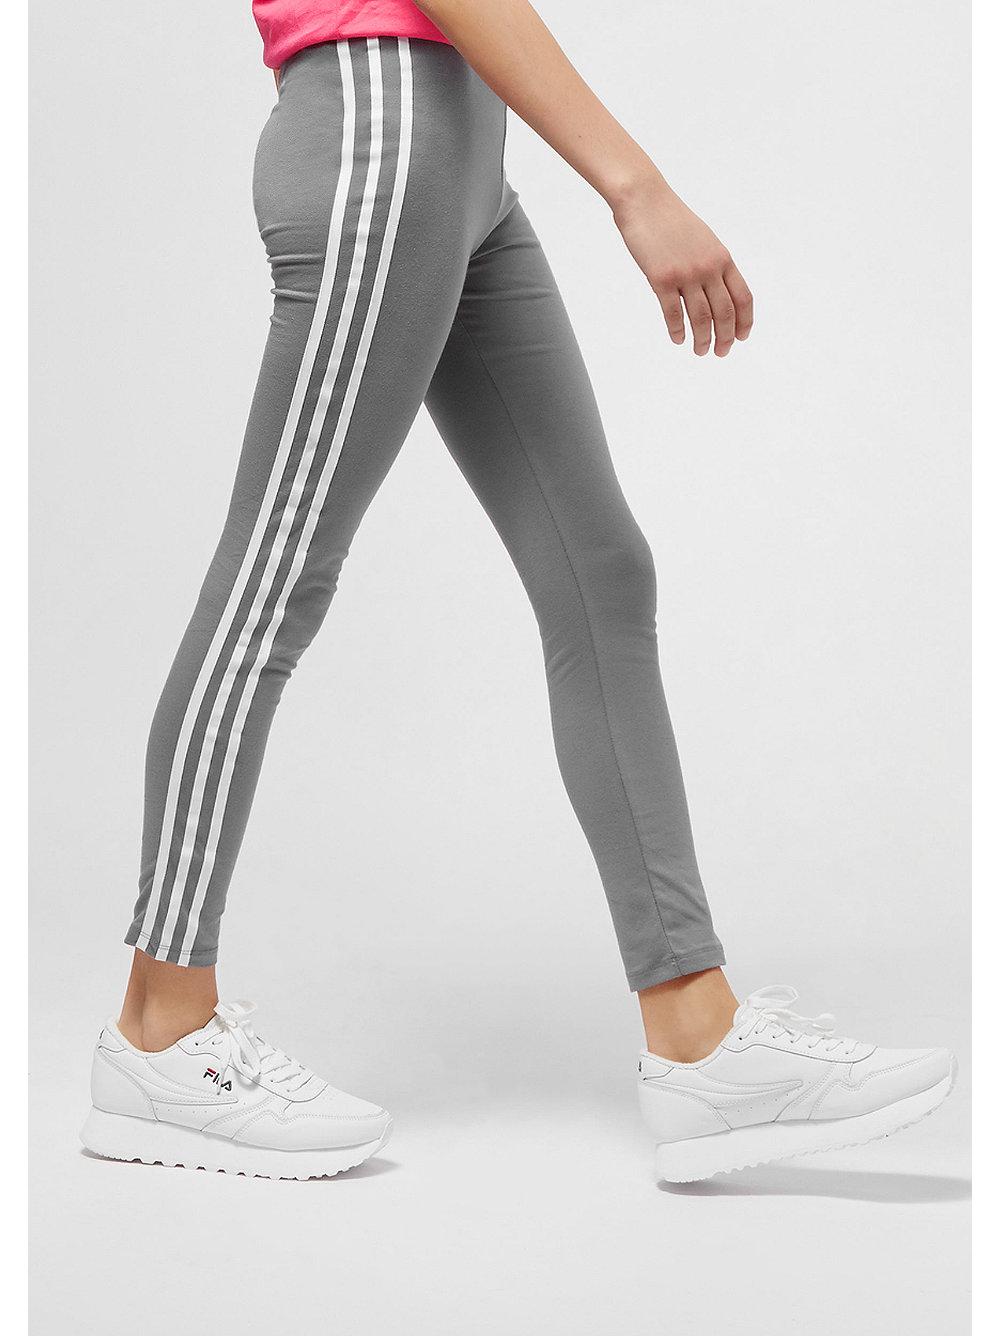 adidas kids 3 stripes leggings grau bei snipes bestellen. Black Bedroom Furniture Sets. Home Design Ideas